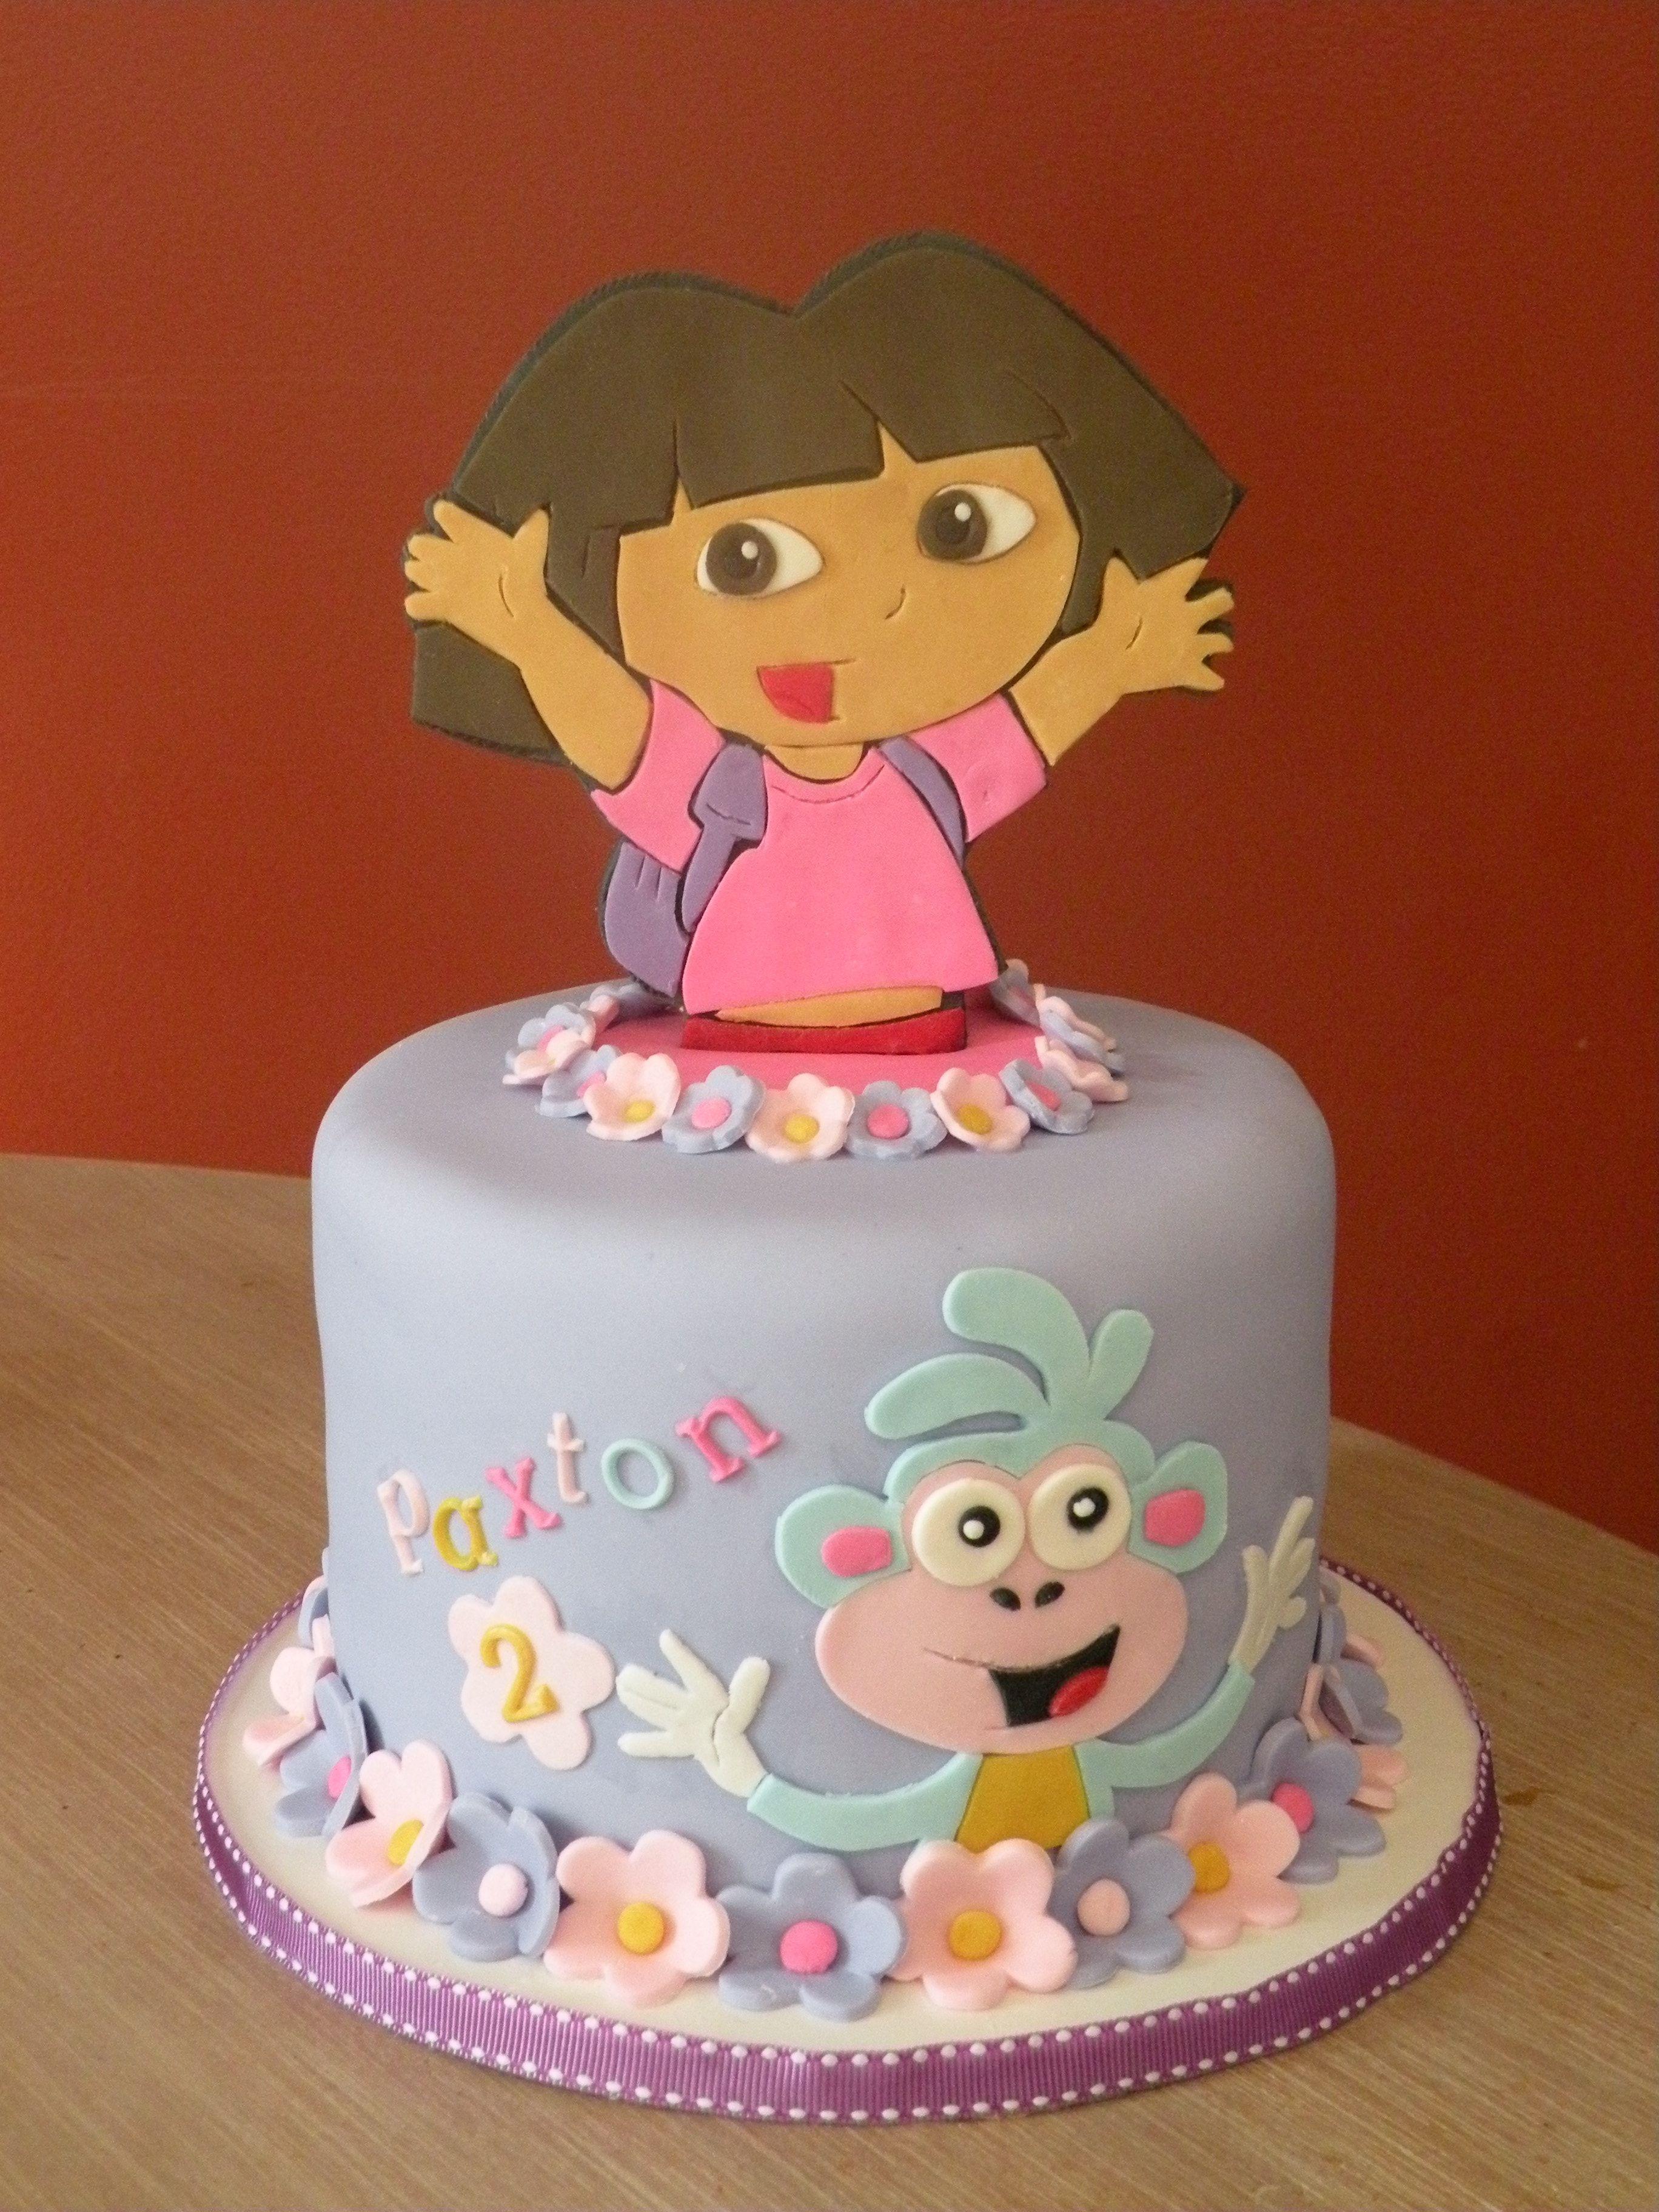 Dora and Boots cake | торты для детей мультфильмы | Pinterest | Cake ...